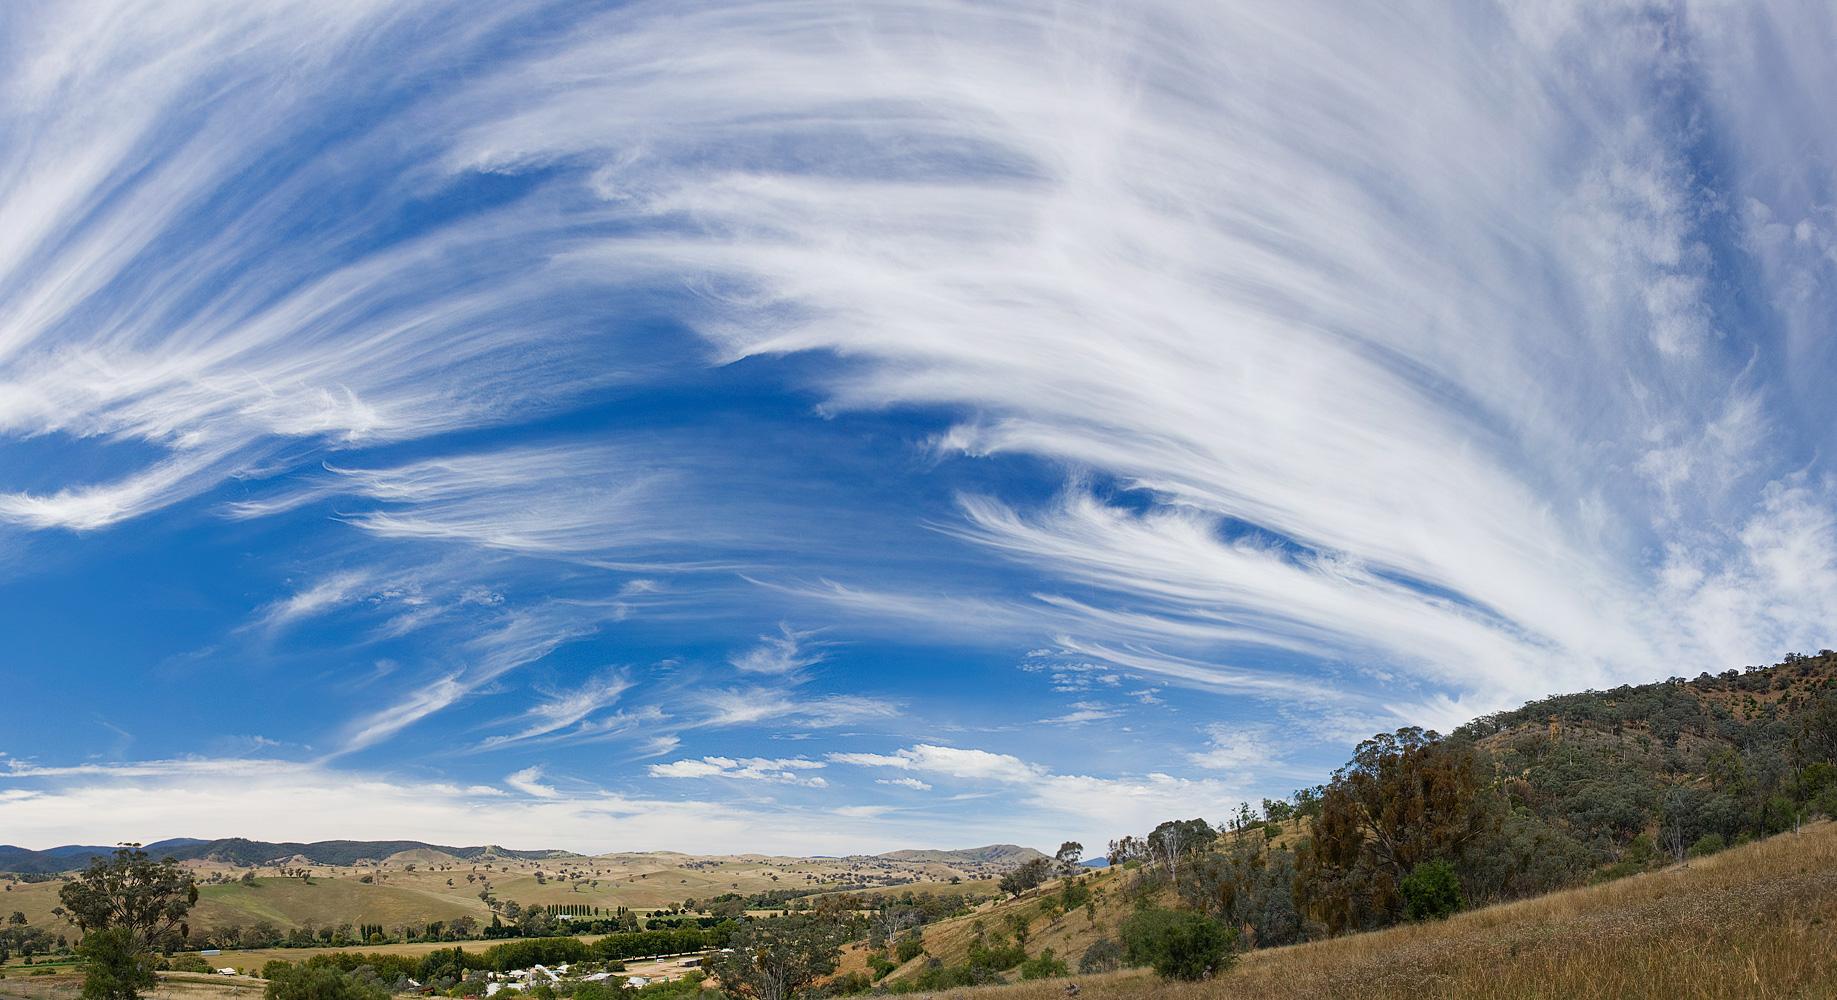 Cirrus cloud in Swifts Creek, Victoria. Photo by Fir0002/Flagstaffotos